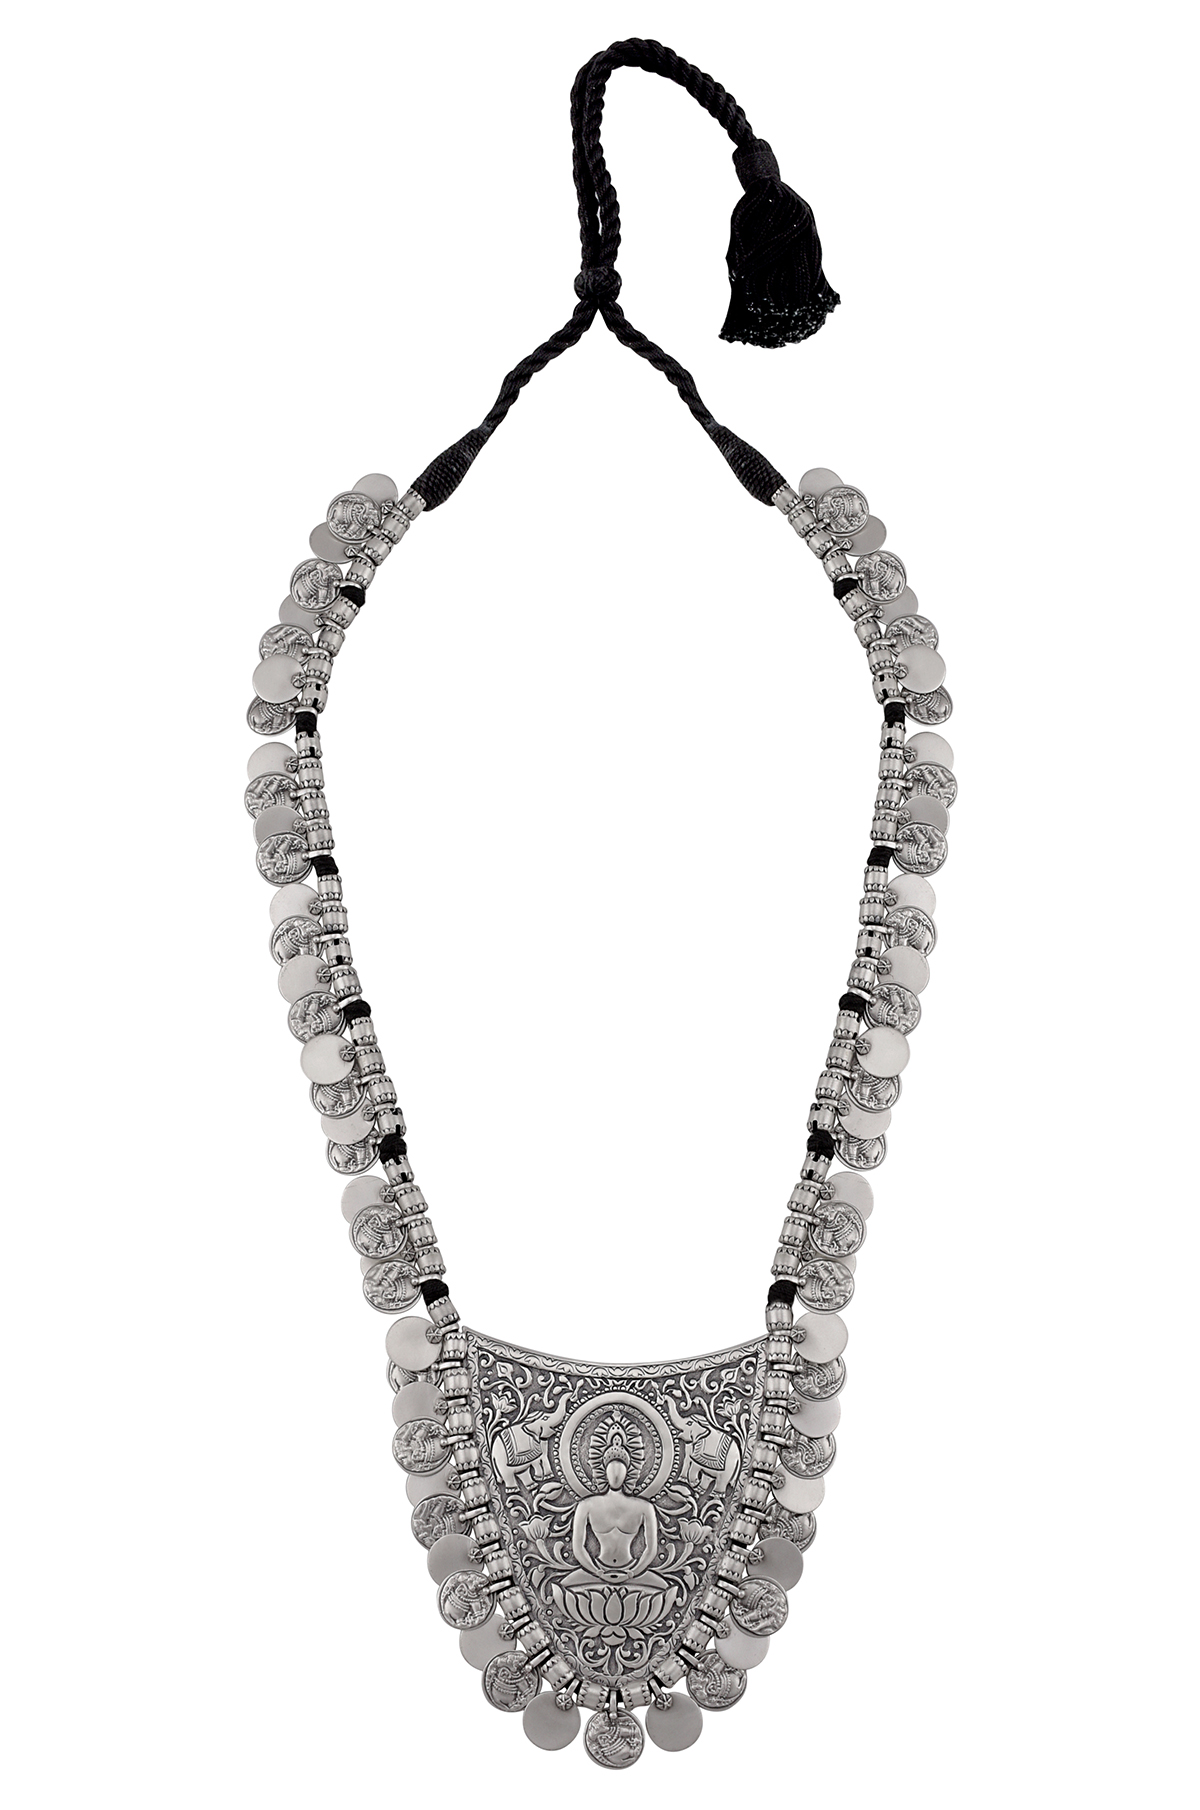 Silver Oxidised Buddha Elephant Coin Necklace